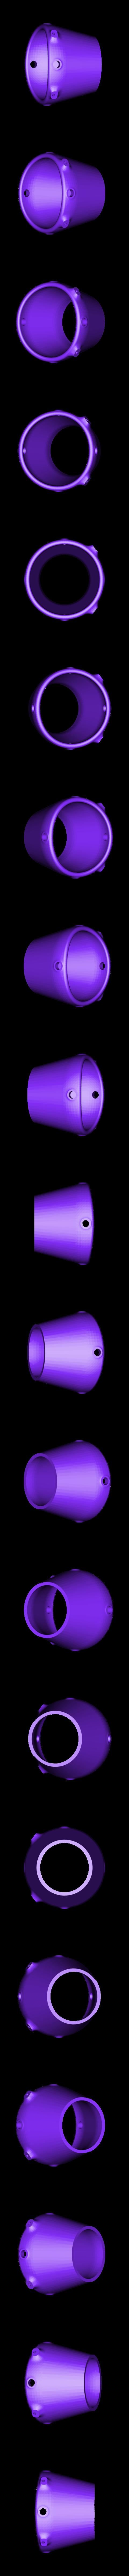 nozzle new.STL Download STL file Water Jet propulsion unit • 3D print design, toto44